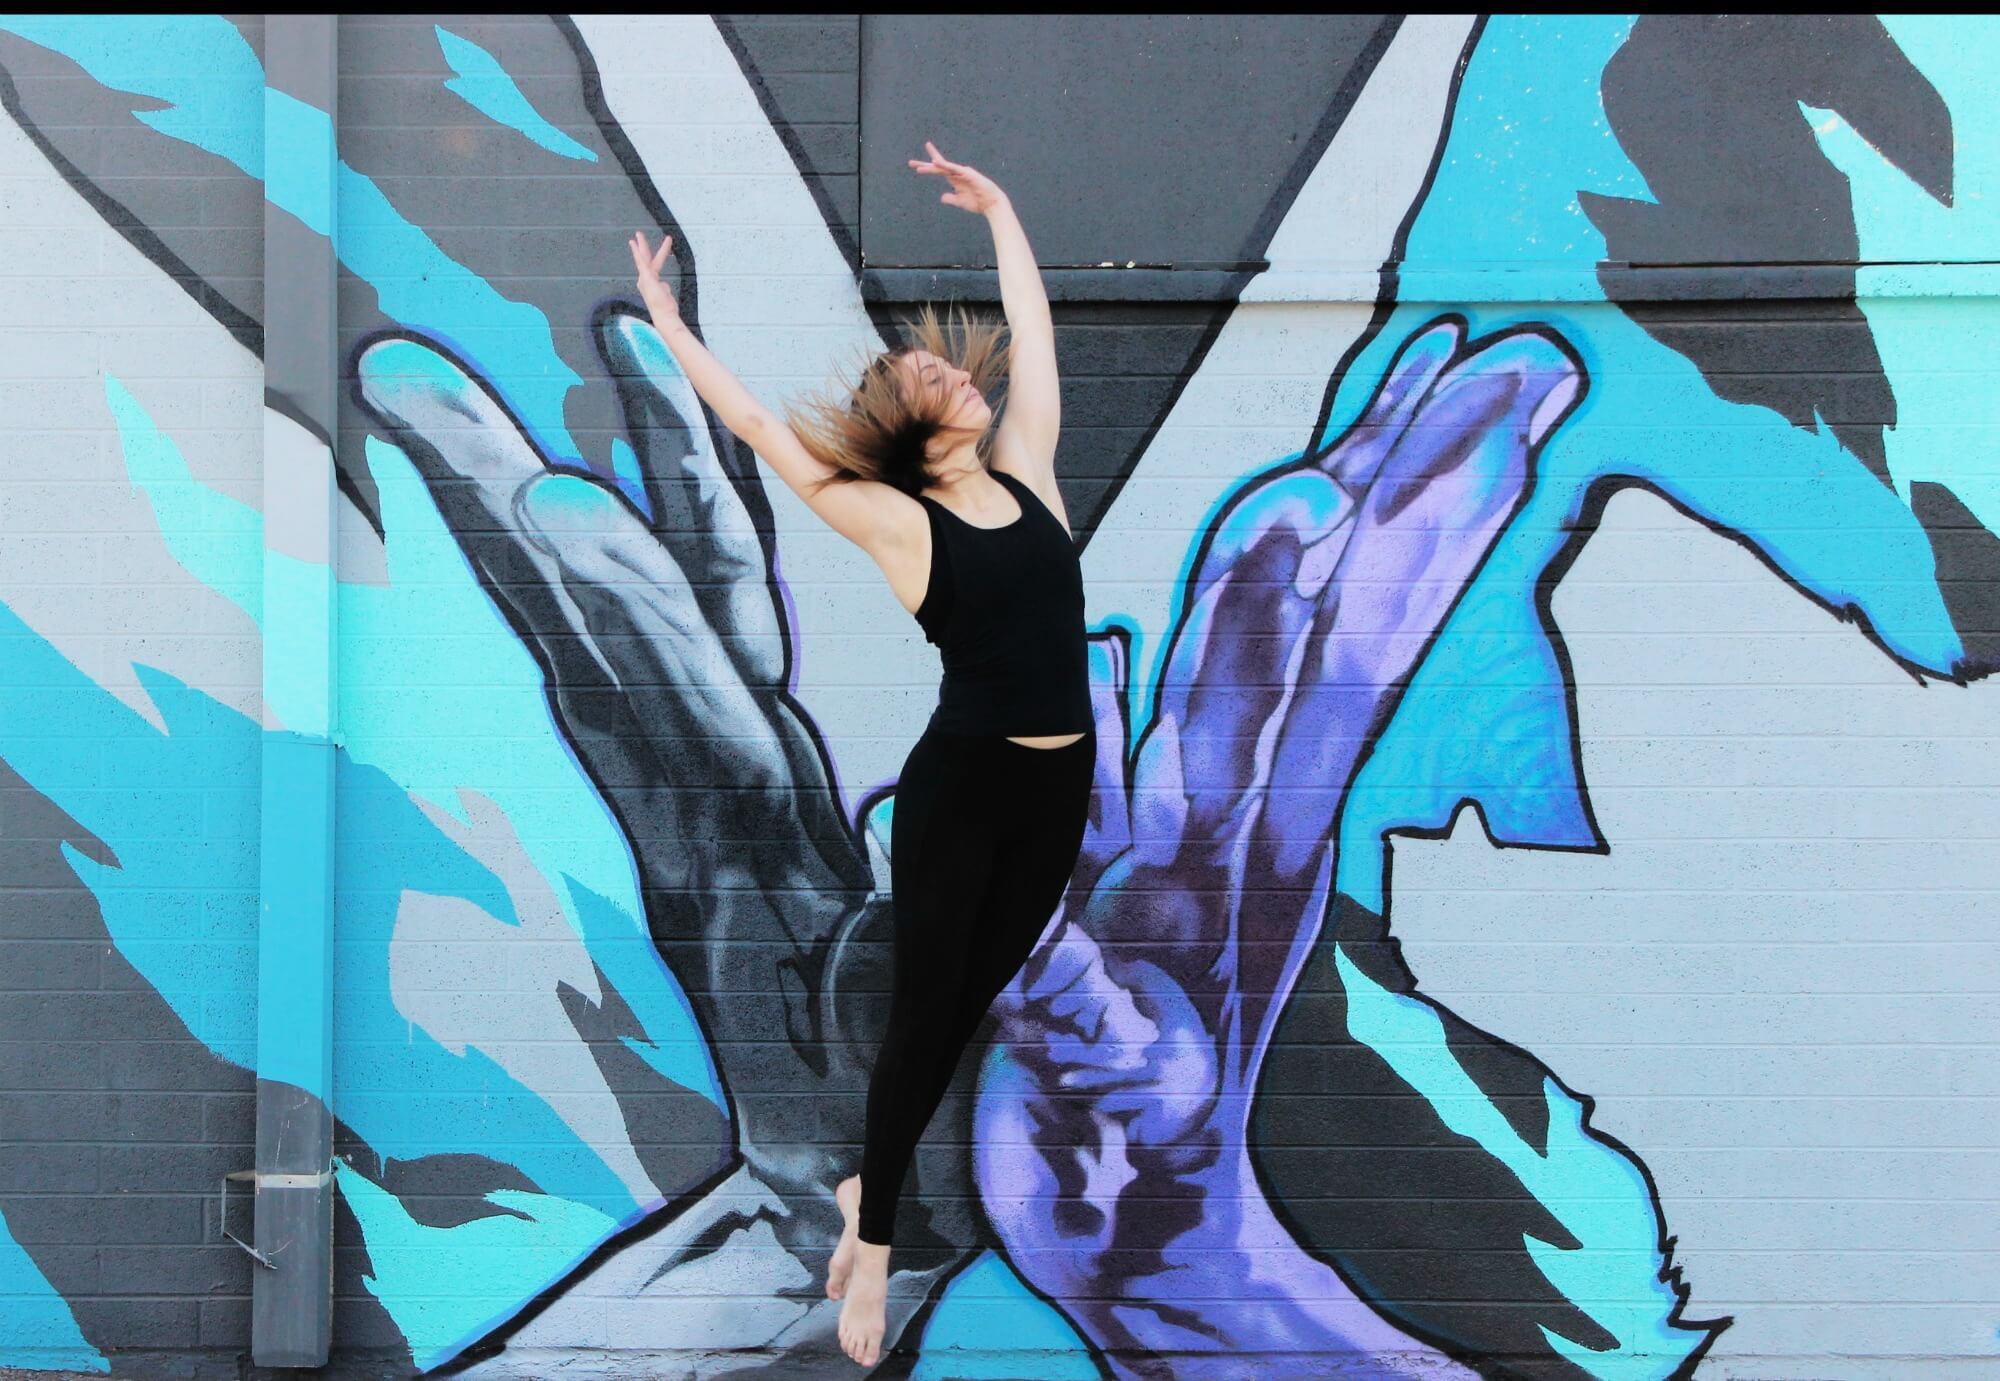 Dancer Randee Powell in front of a mural by Joerael JE. Photo: Ashley Baker.